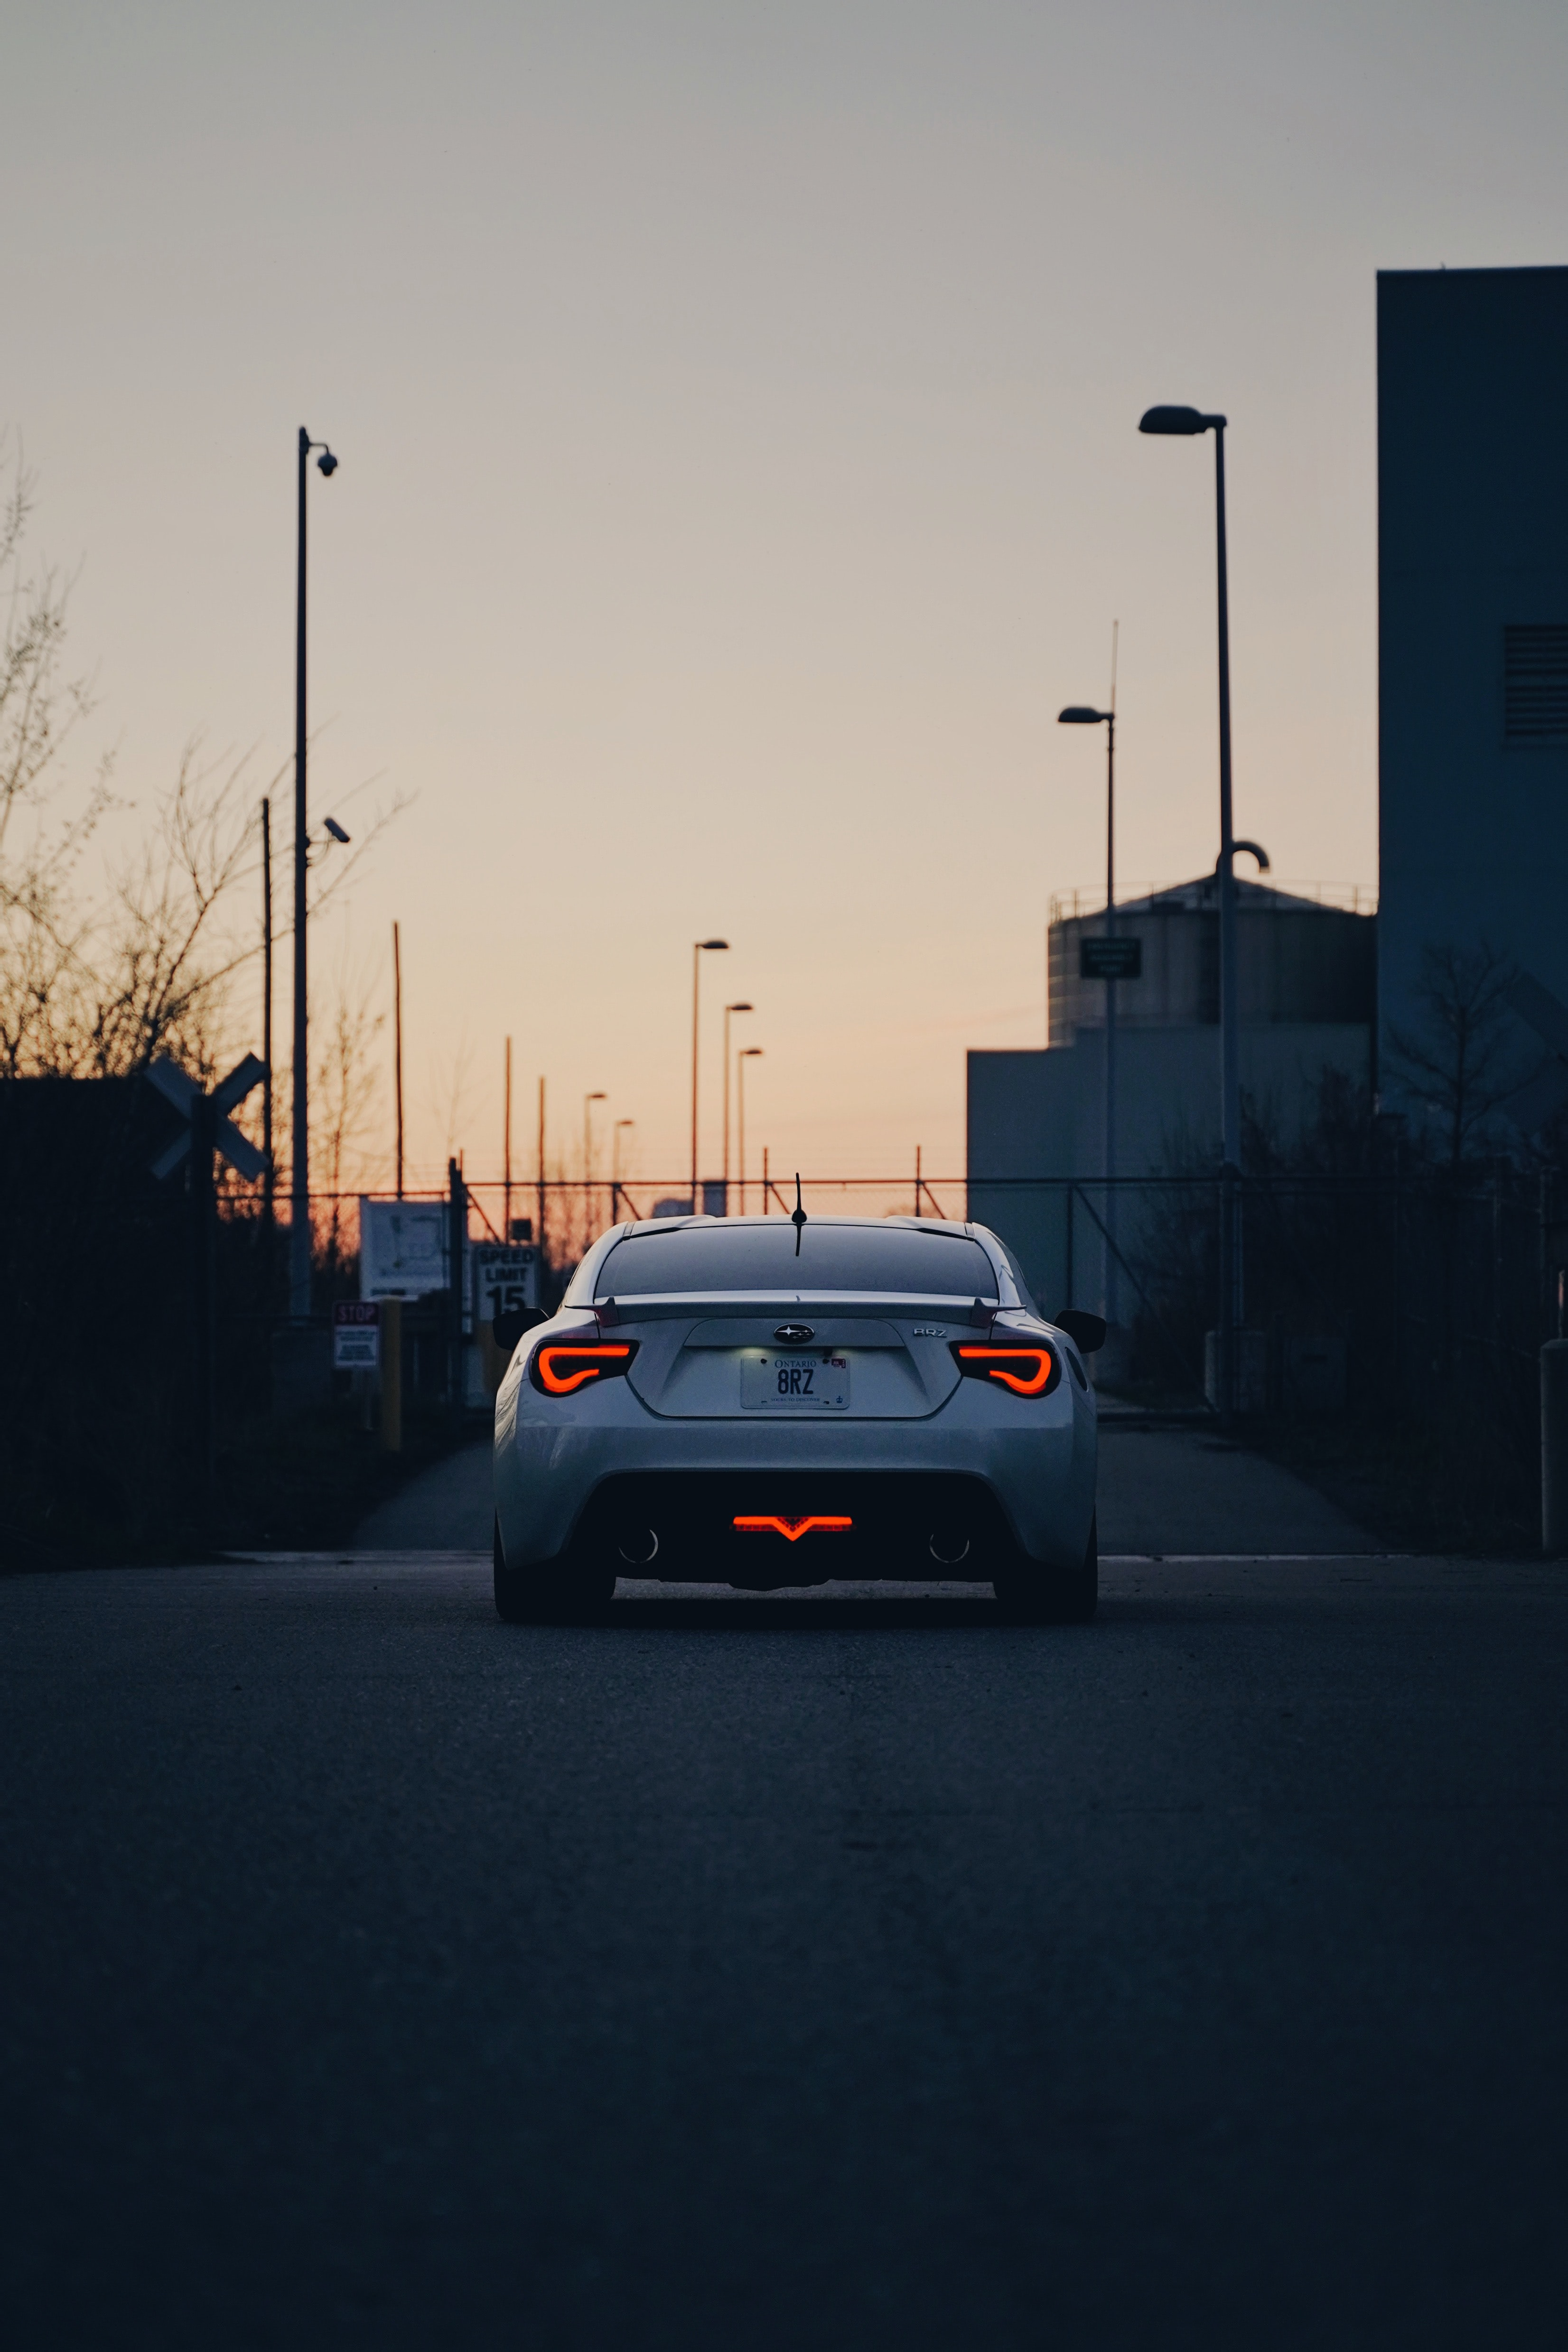 111399 Screensavers and Wallpapers Subaru for phone. Download Sports, Subaru, Cars, Car, Sports Car, Back View, Rear View, Spoiler, Subaru Brz pictures for free